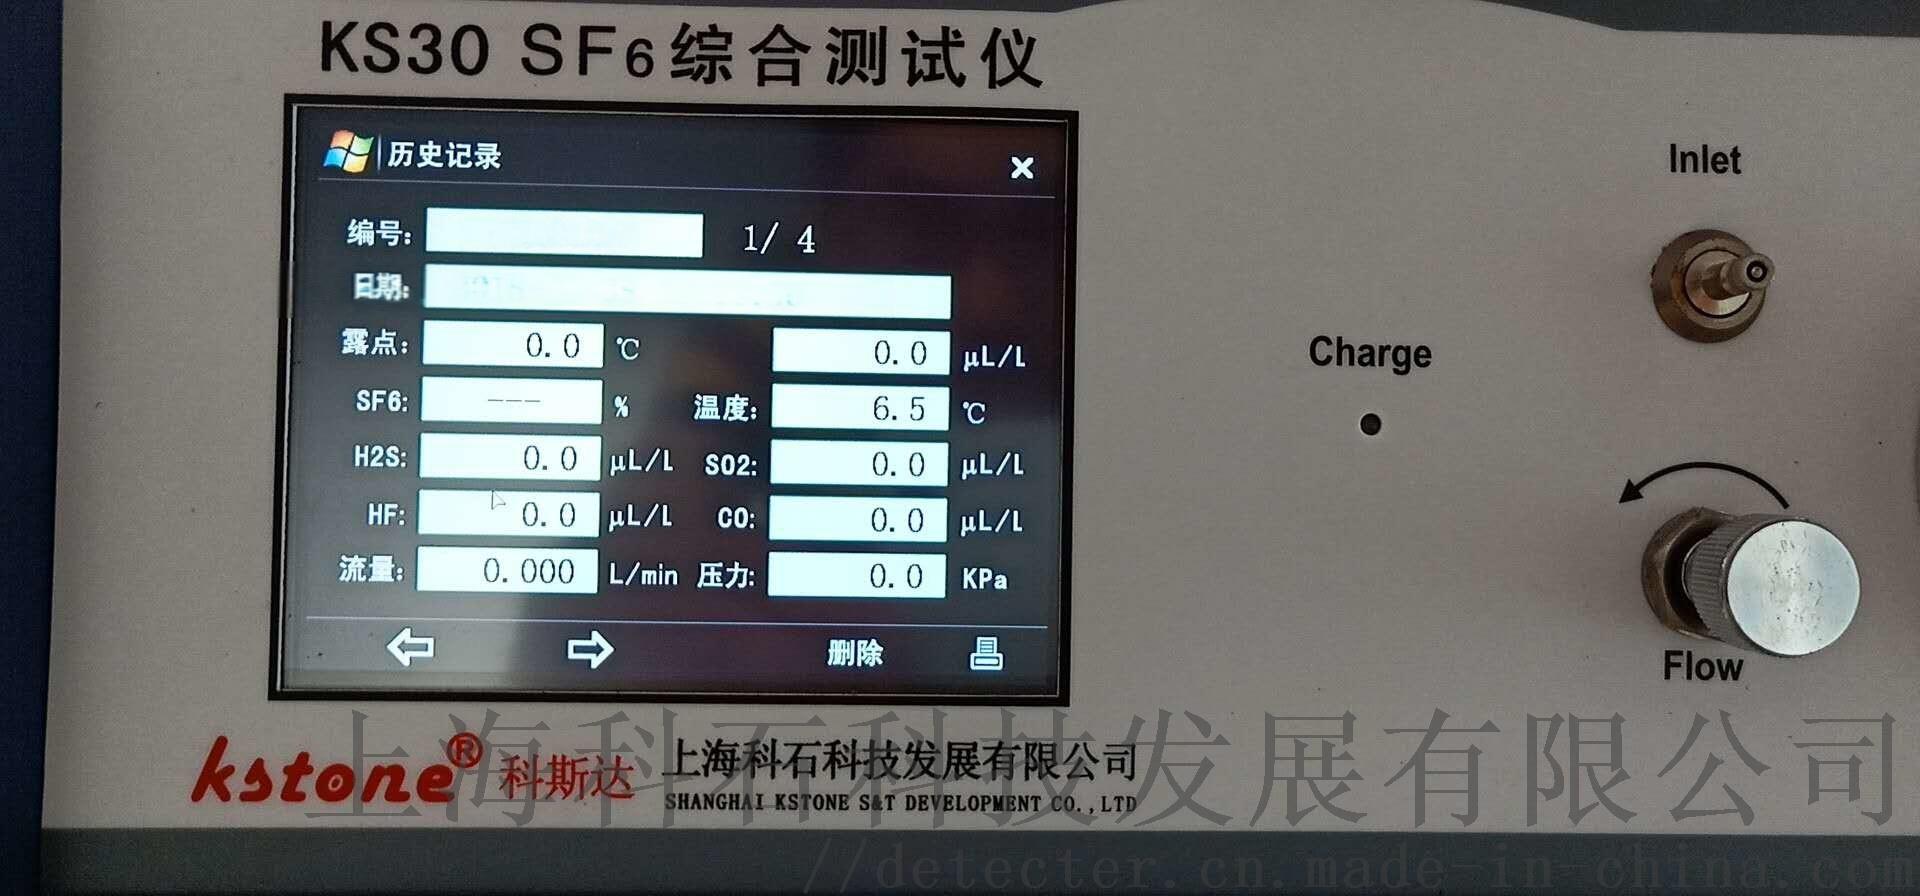 KS30 測試頁面圖.jpg